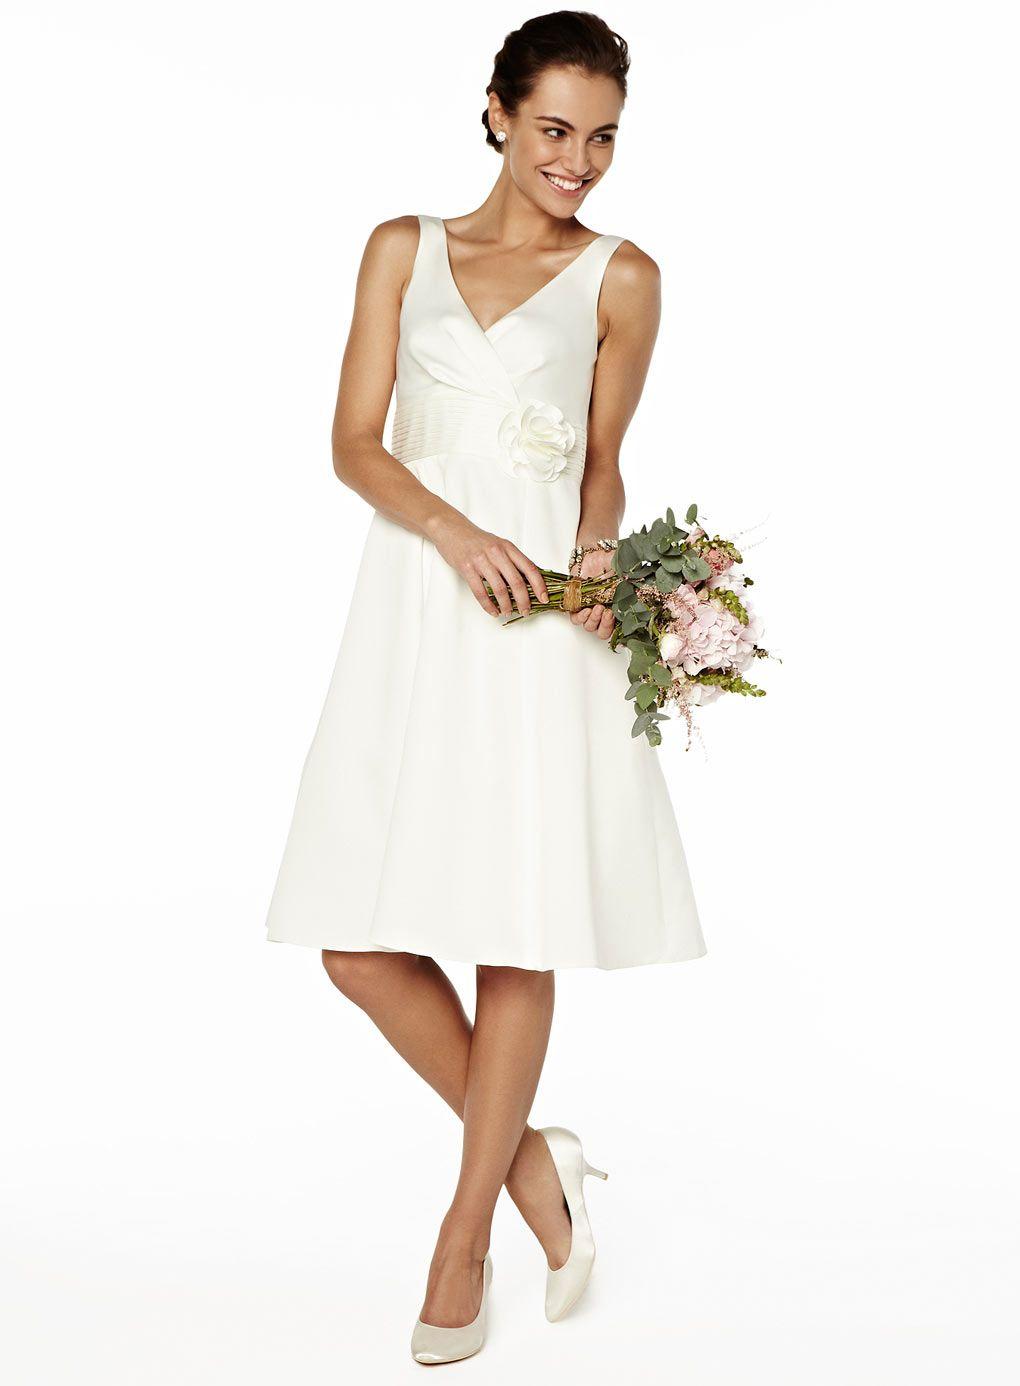 Rose short bridal dress httpweddingheartbhs wedding rose short bridal dress httpweddingheart ombrellifo Gallery